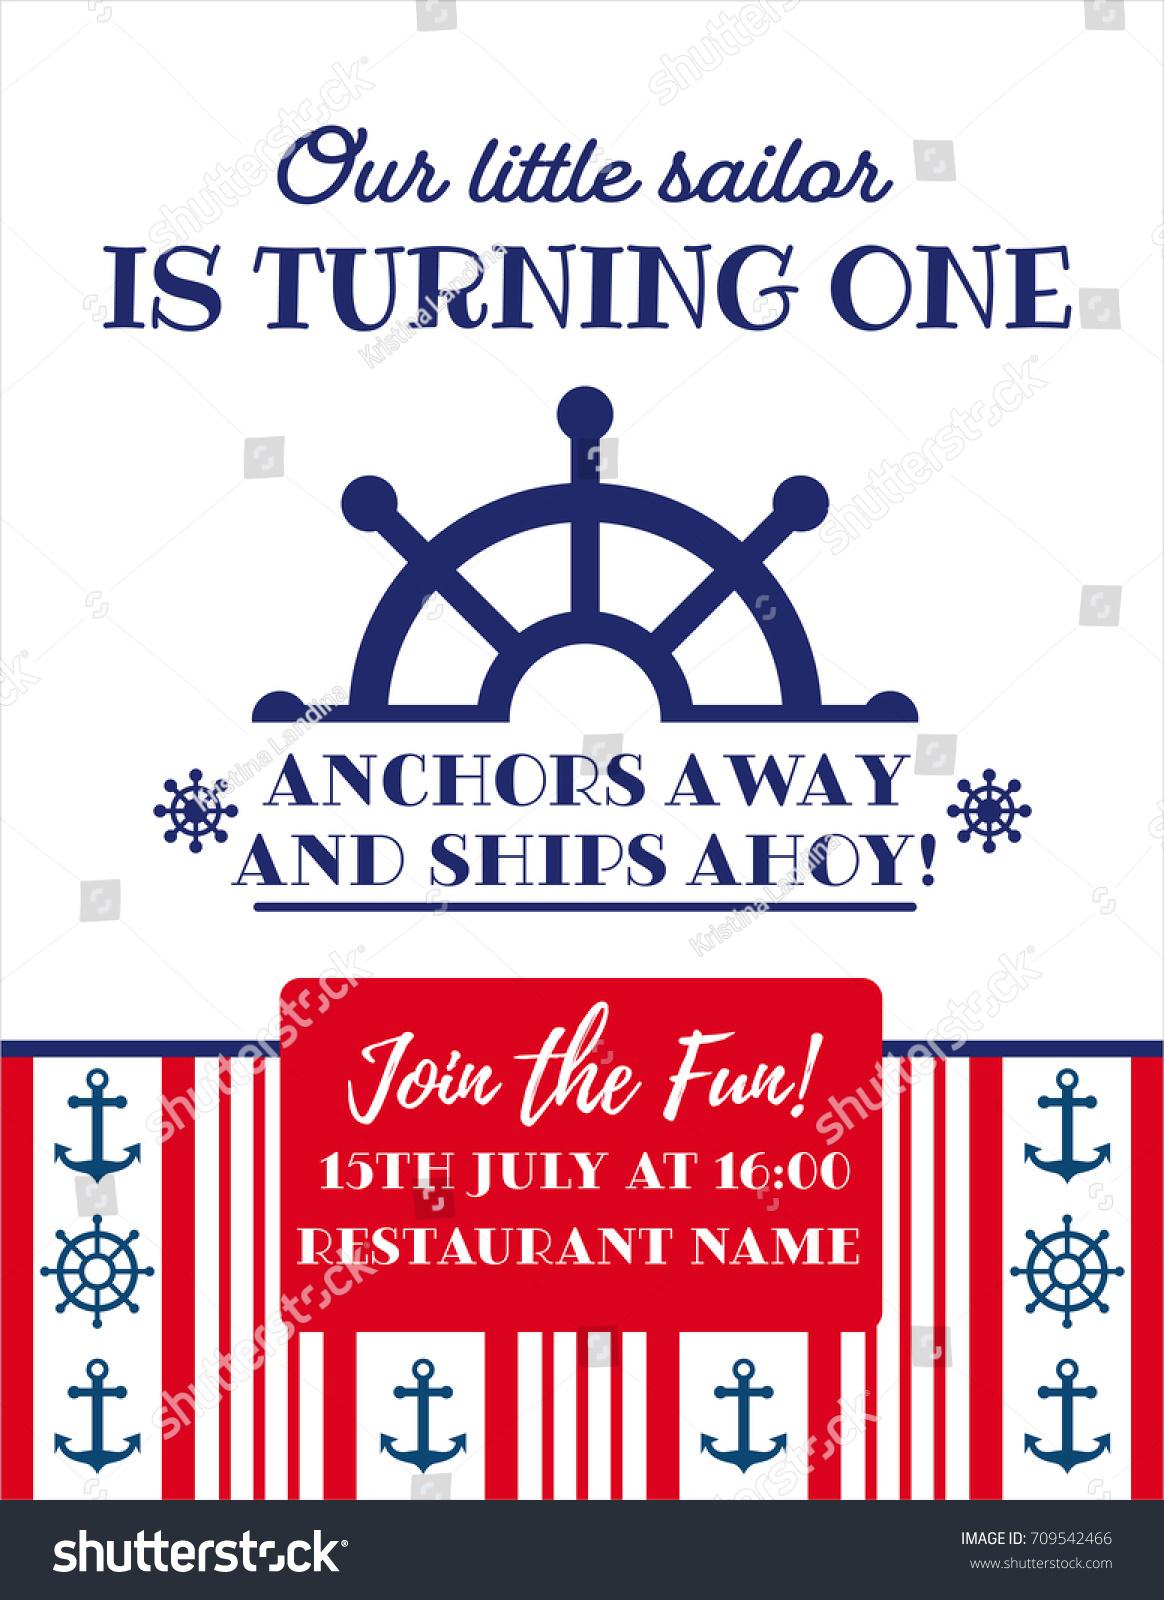 Nautical Party Invitation Choice Image - Party Invitations Ideas